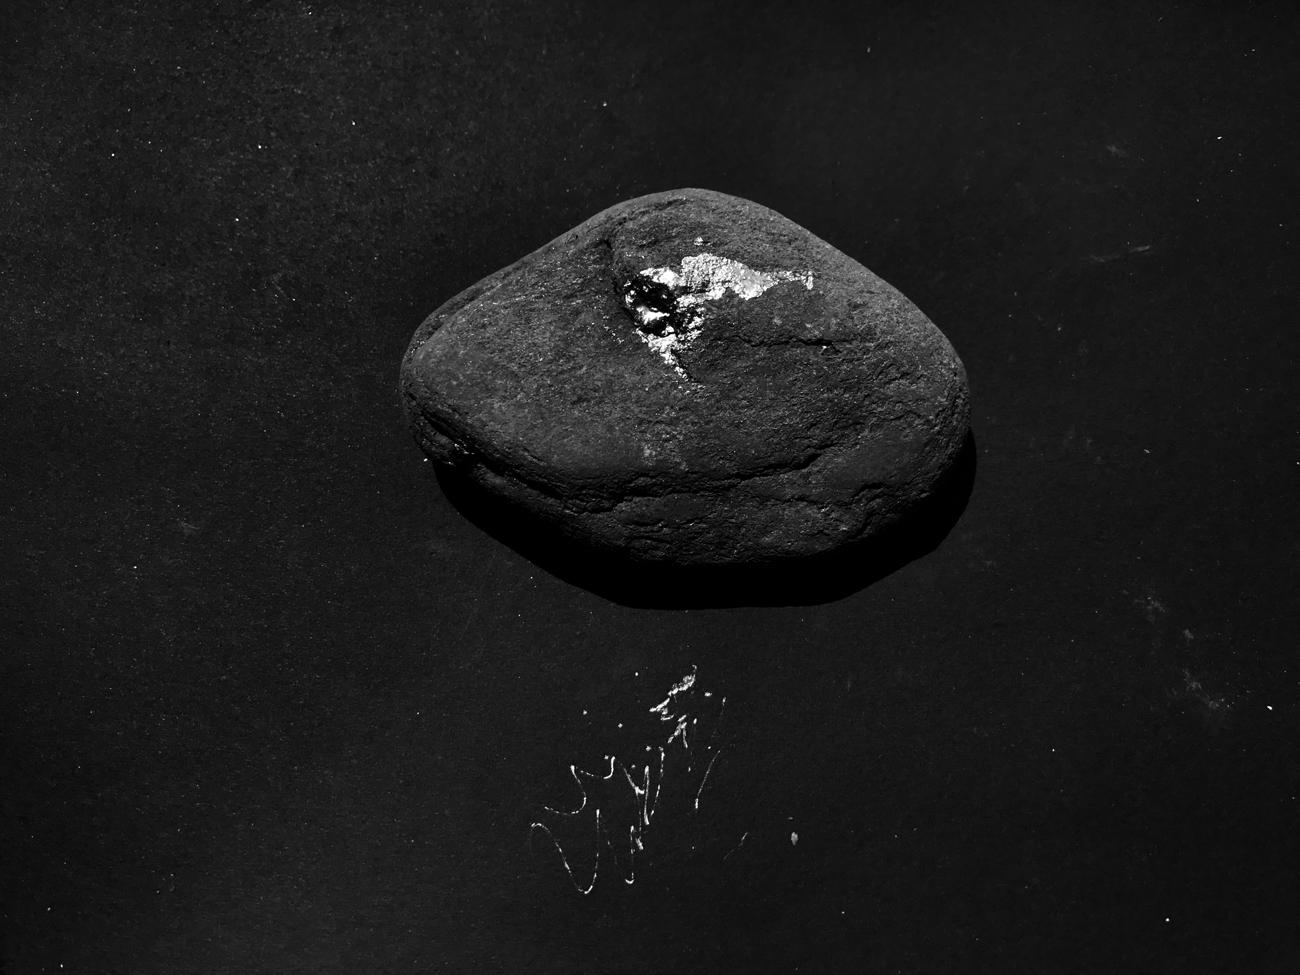 Stone, 2017, archival pigment print, 112x150 cm